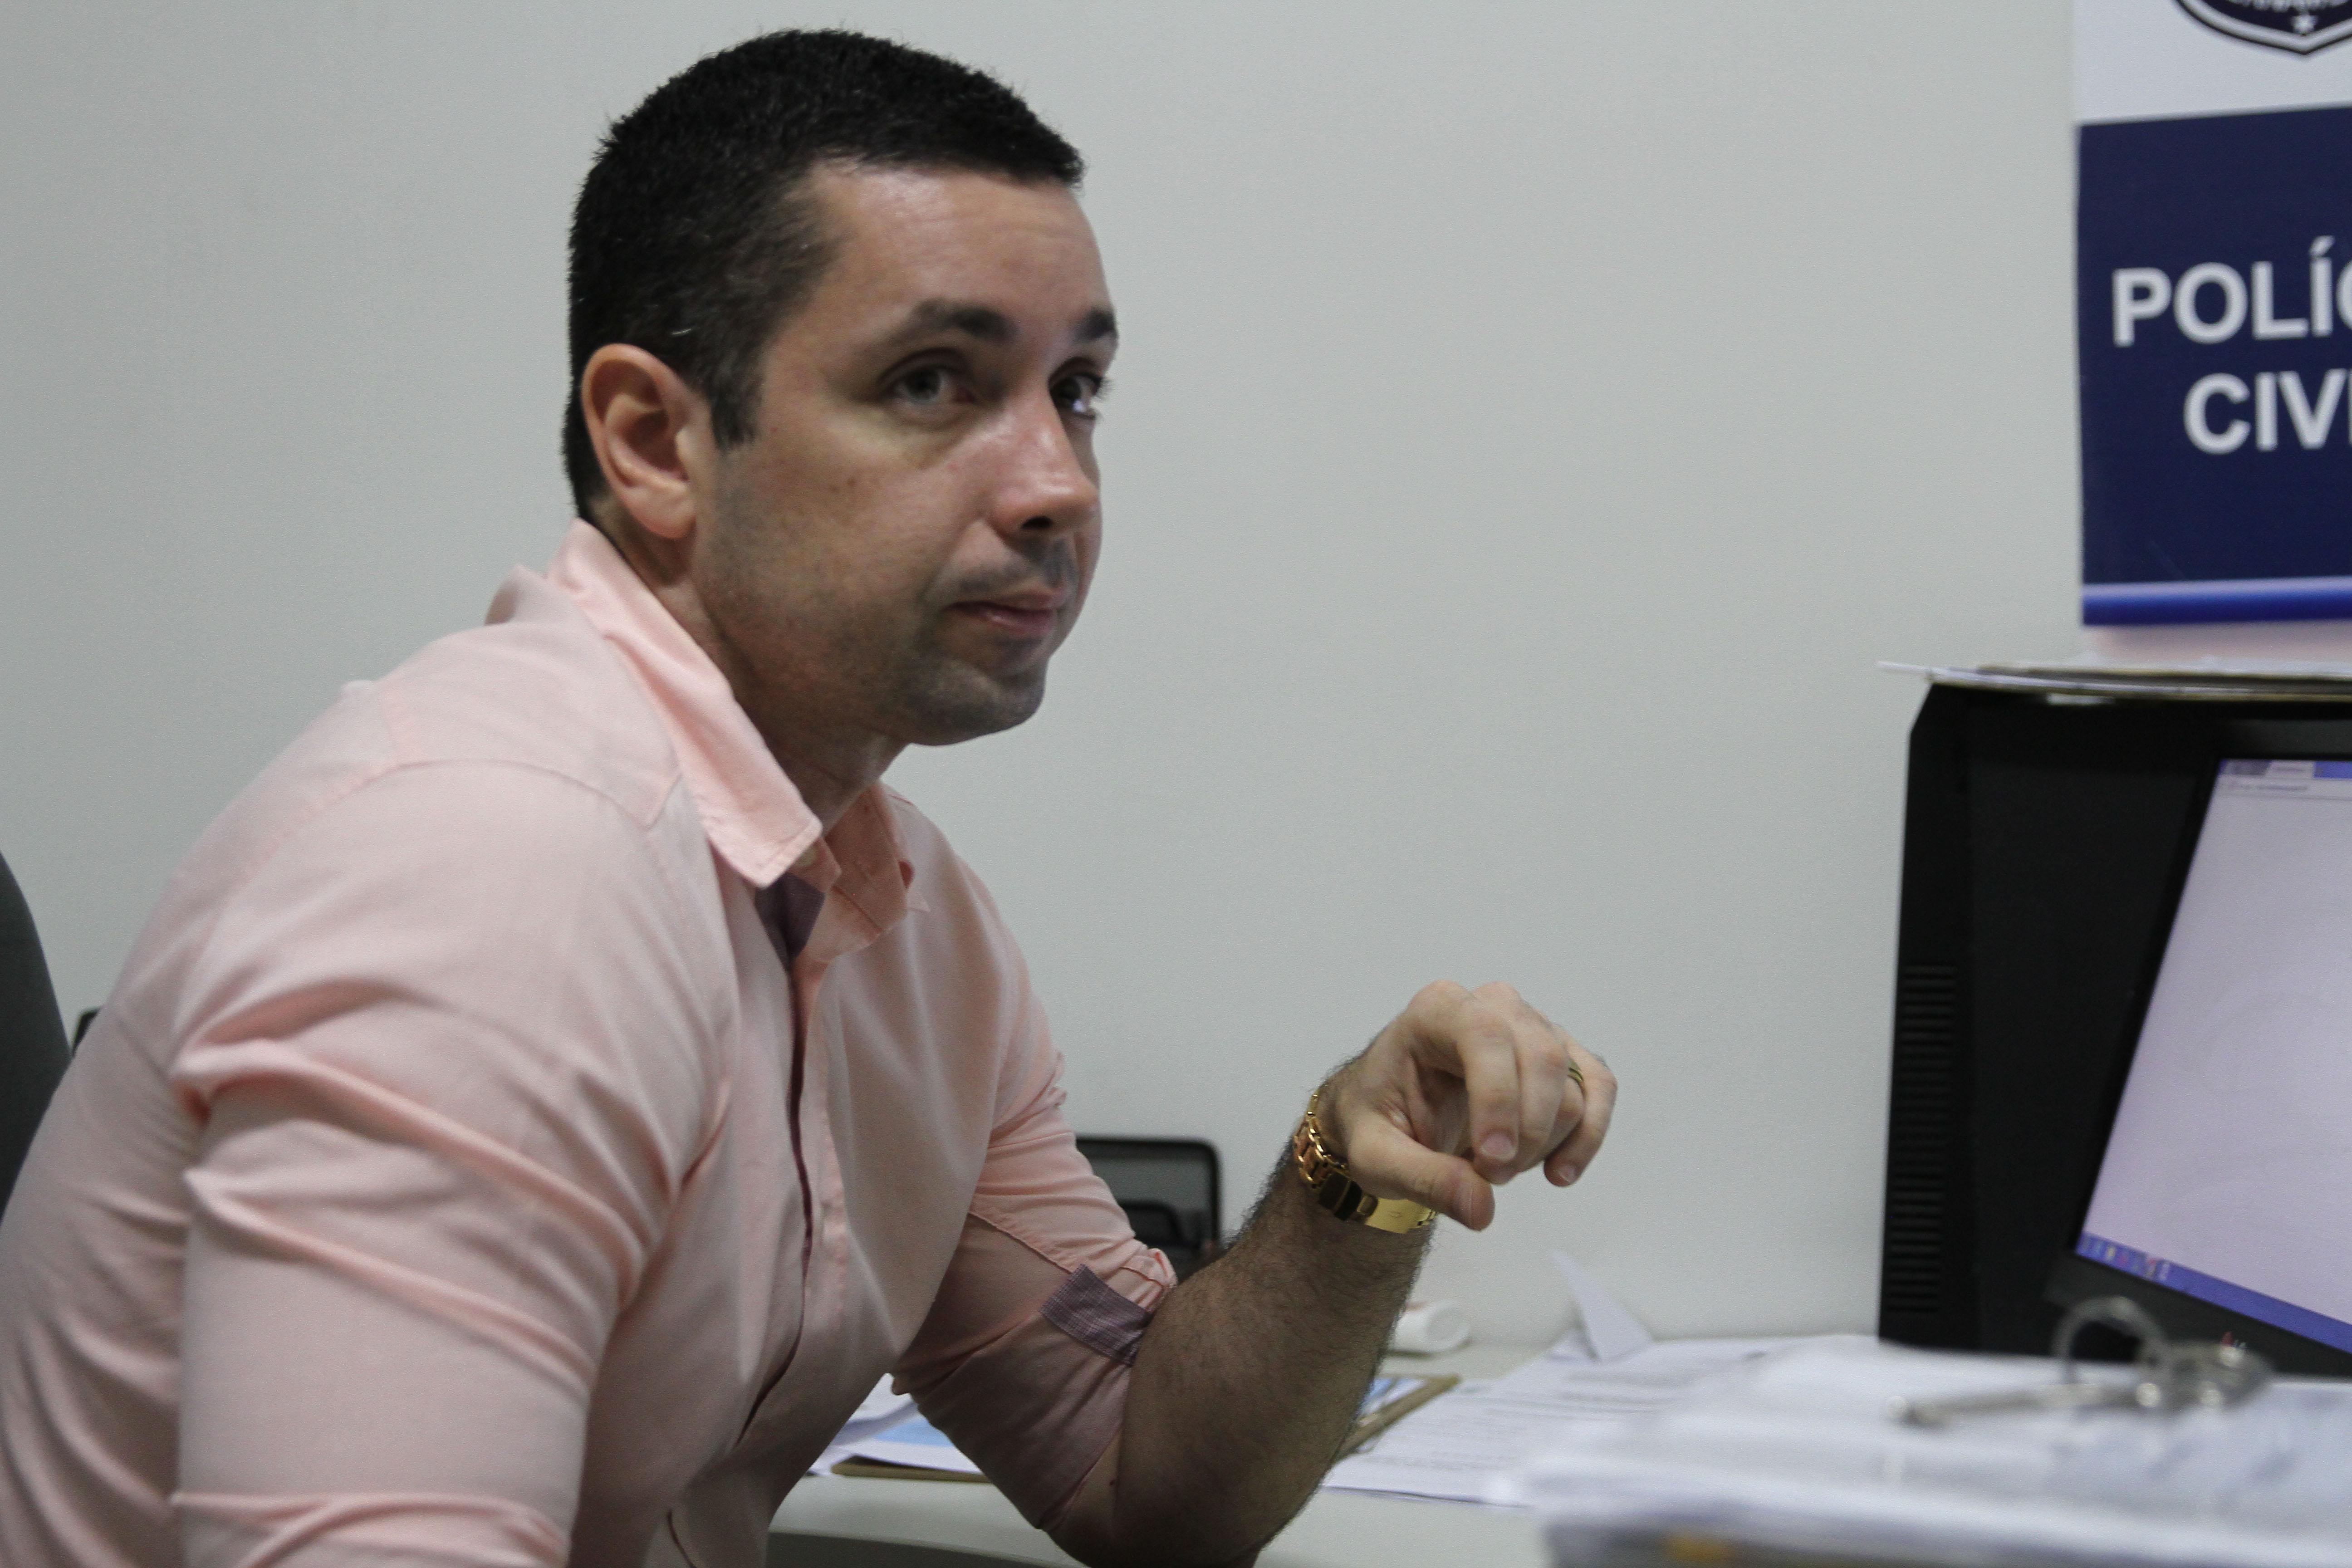 O delegado Carlos Couto investiga o caso. Foto: Julio Jacobina/DP (O delegado Carlos Couto investiga o caso. Foto: Julio Jacobina/DP)